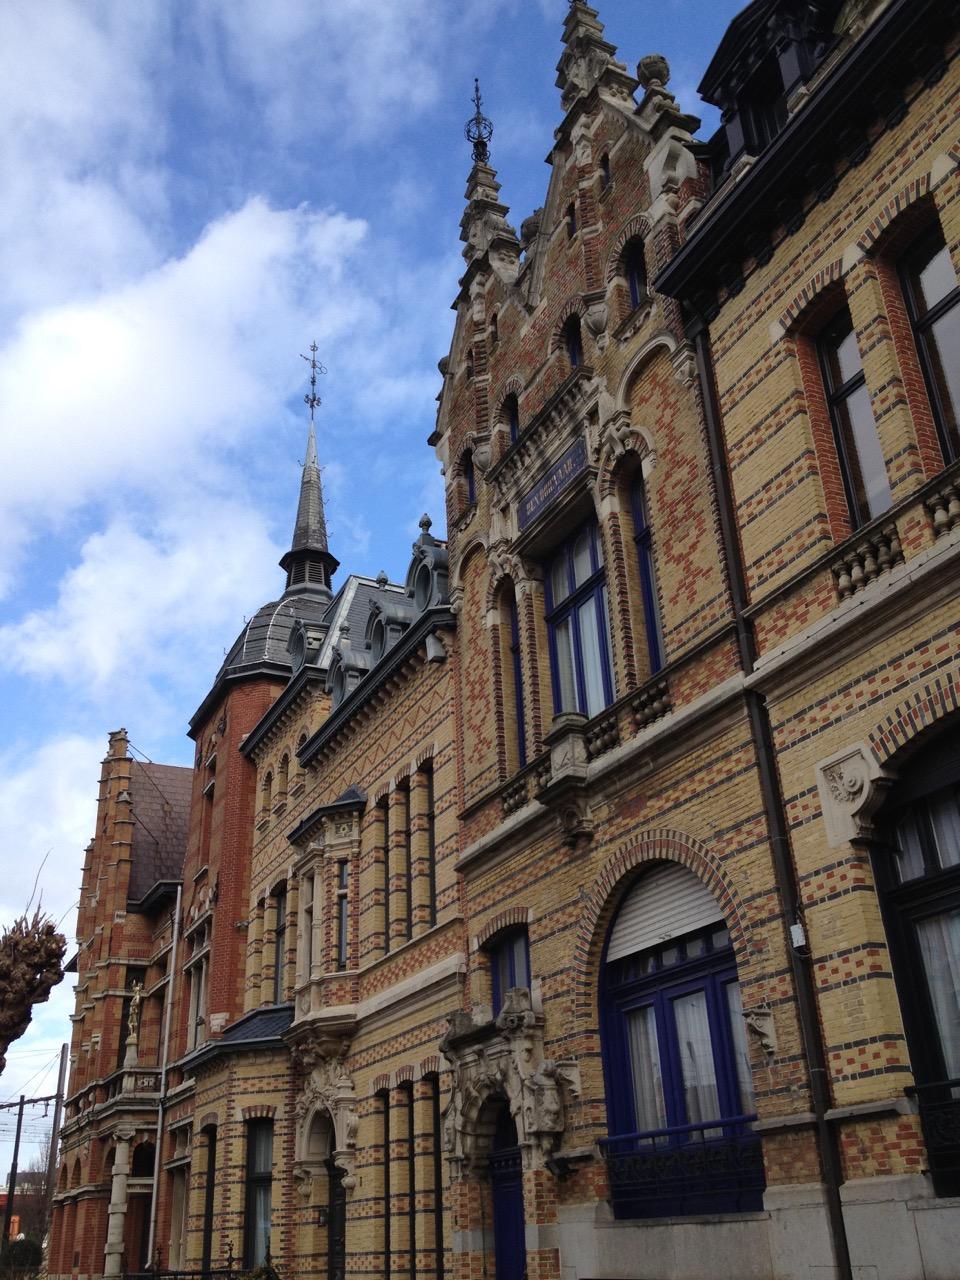 Flemish Renaissance-style brickwork